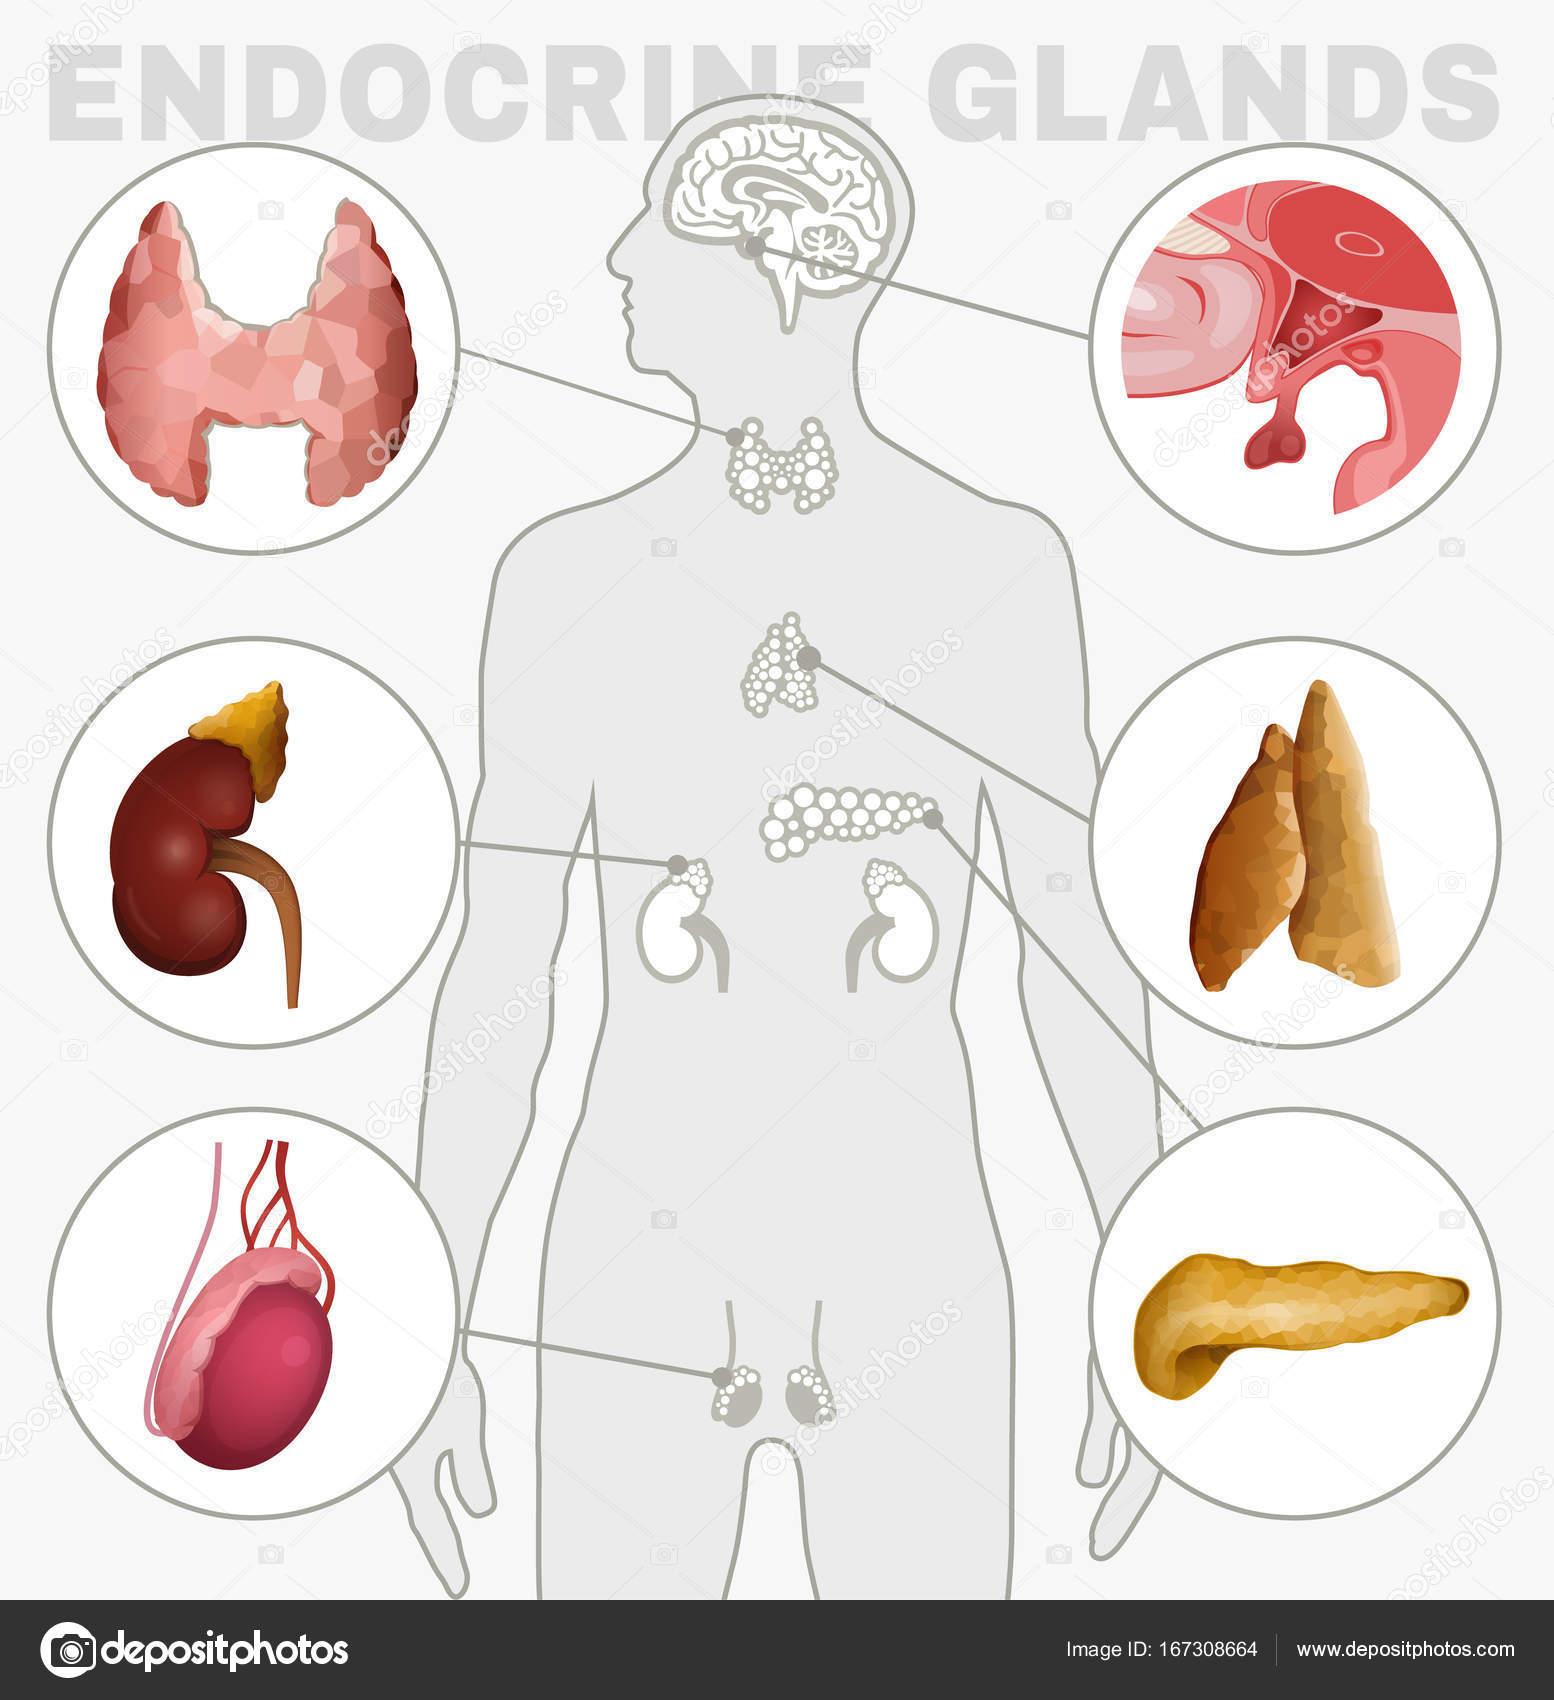 Endokrinen Drüsen Bild — Stockvektor © annyart #167308664